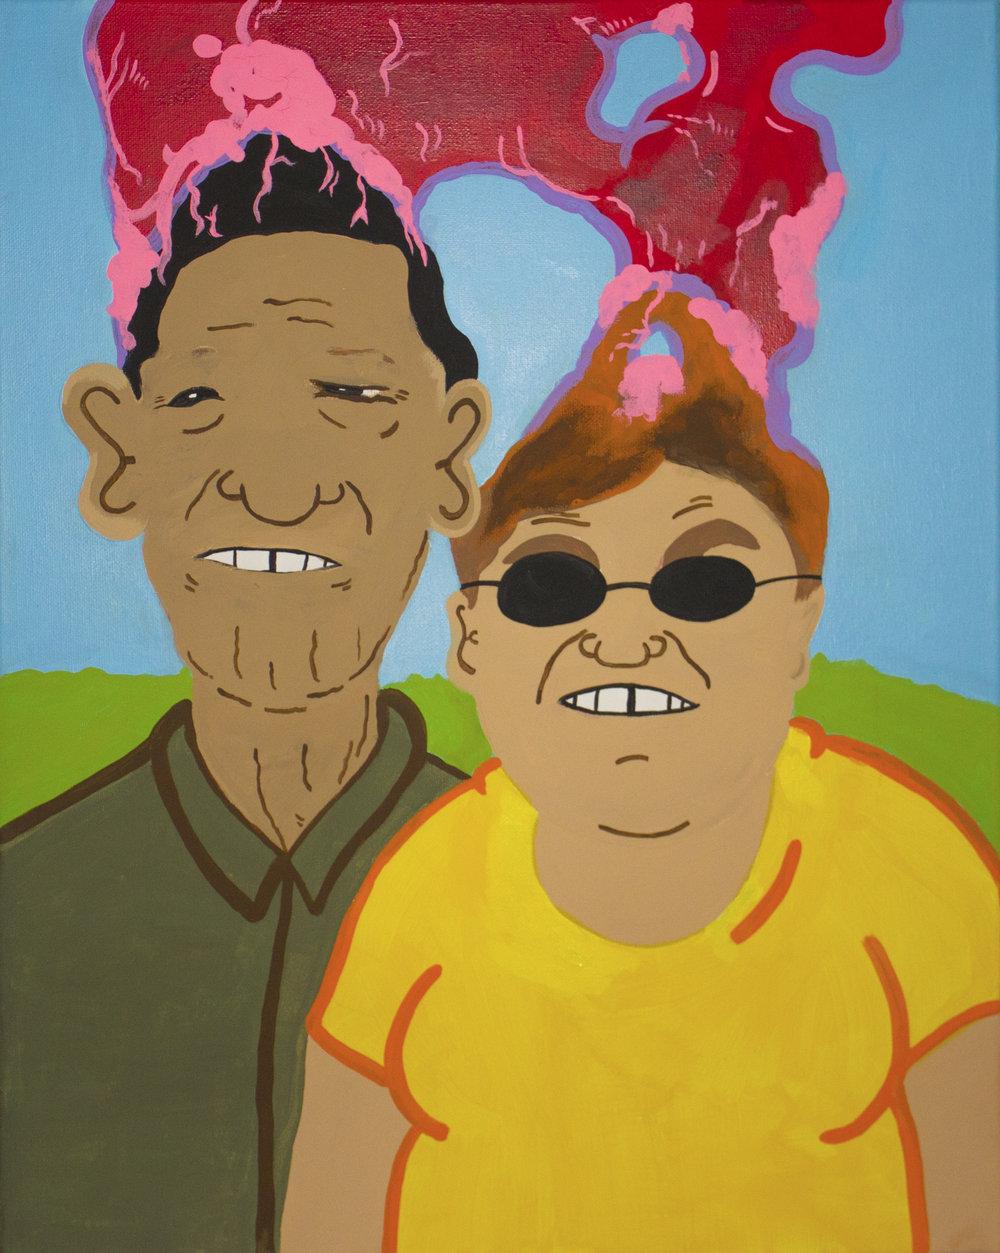 MoMo and PoPo